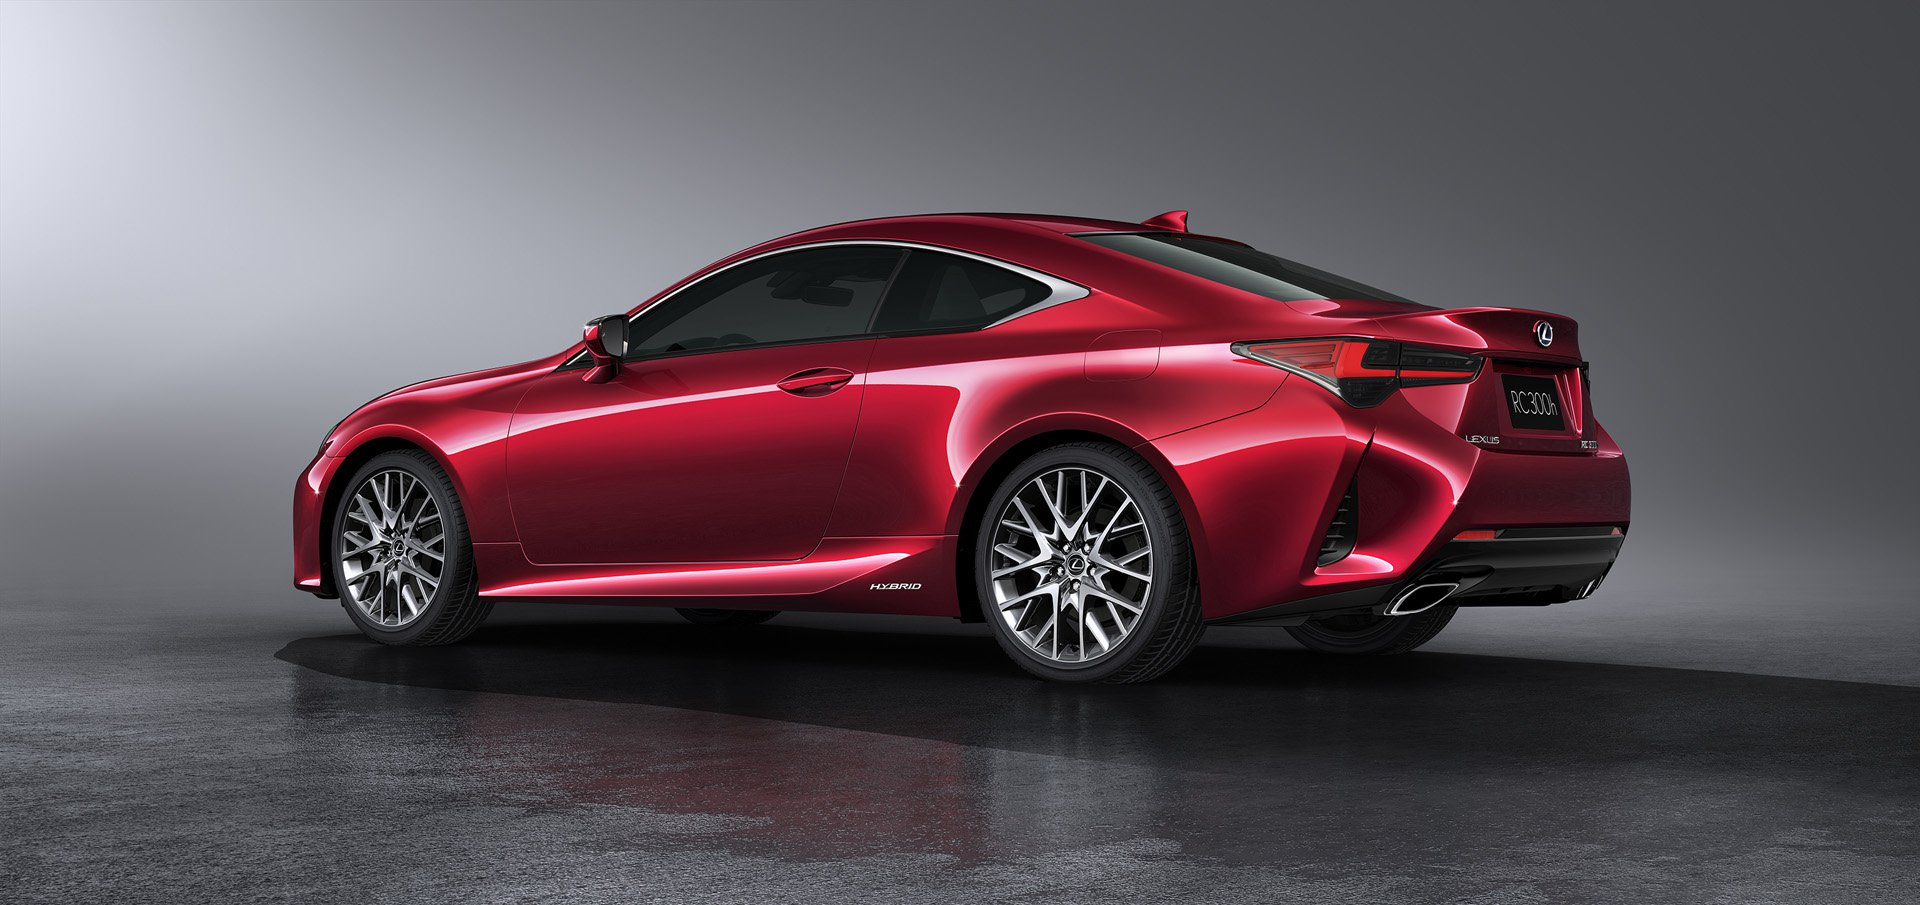 Lexus RC facelift 2019 (7)